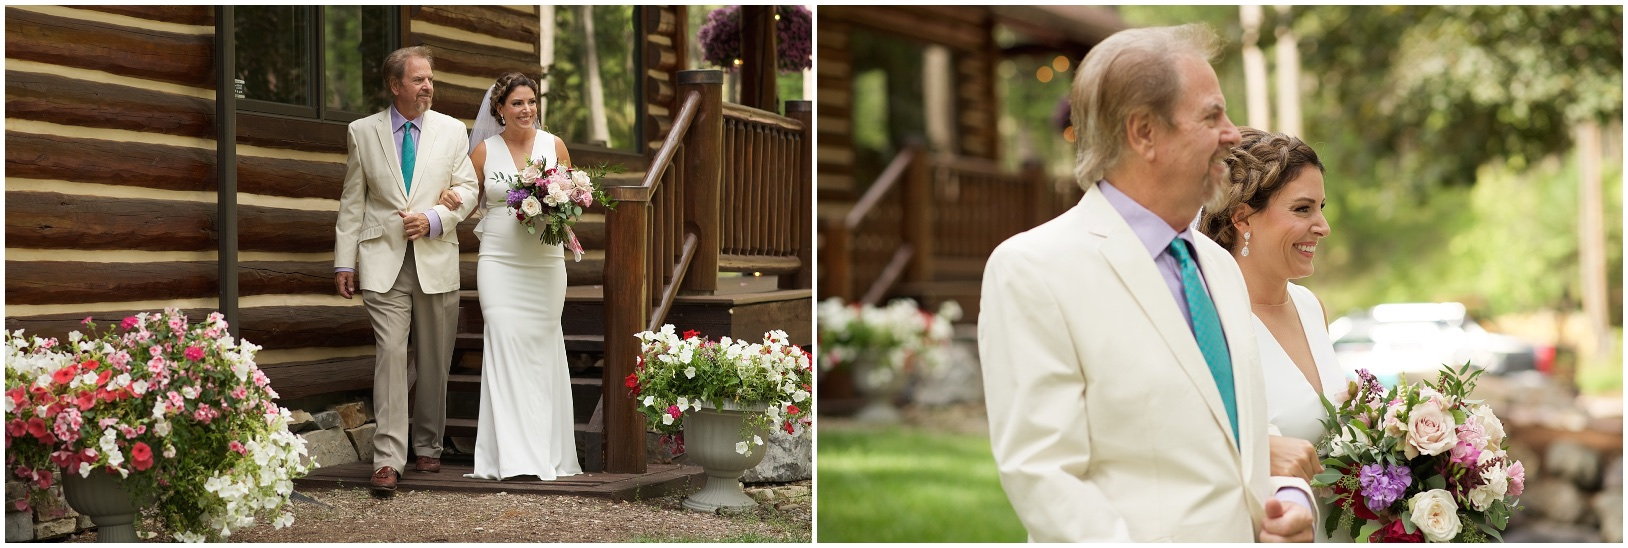 lindseyjane_wedding024.jpg